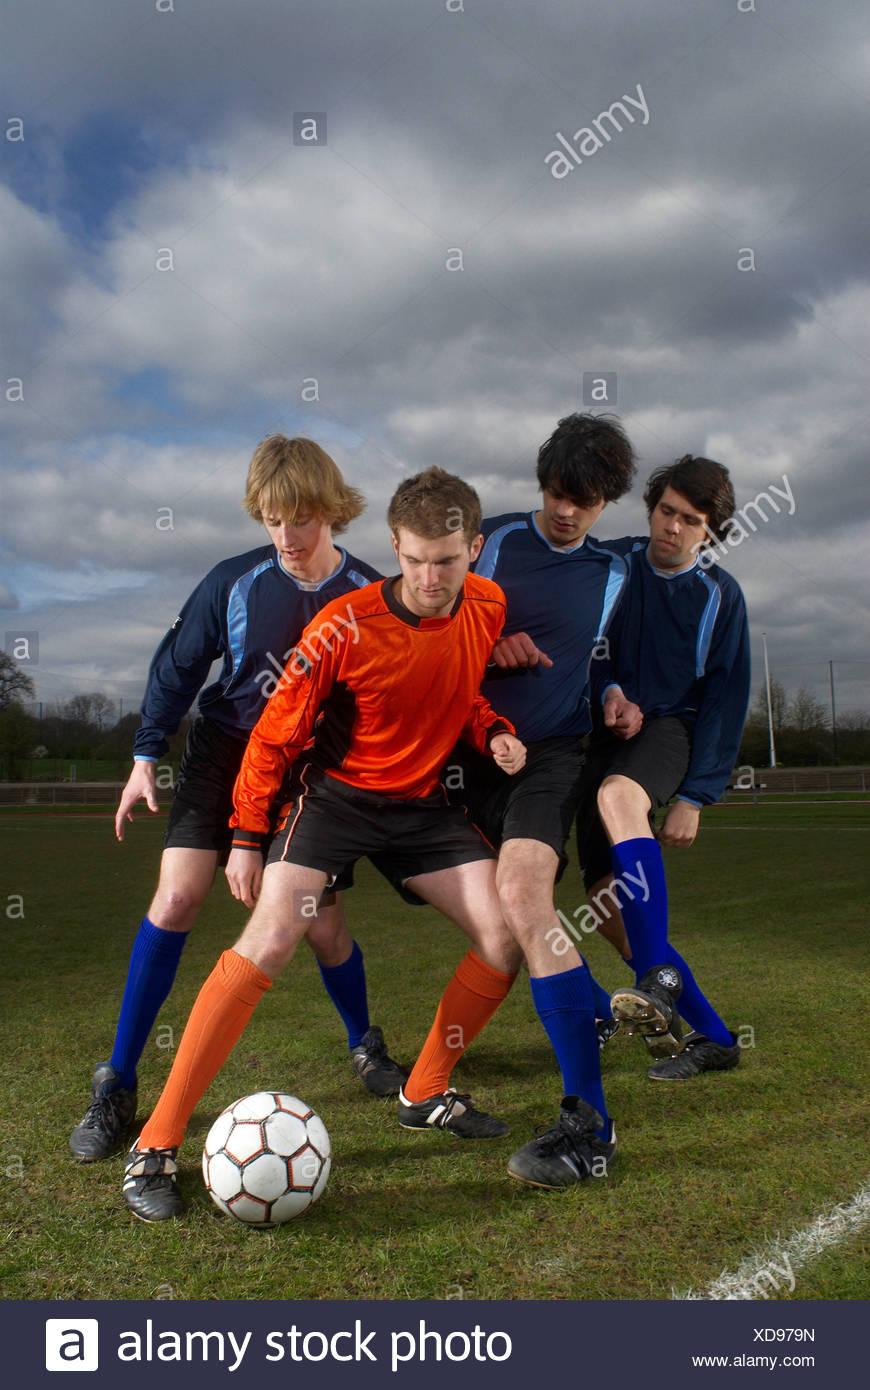 Entouré d'opposition footballeur Photo Stock